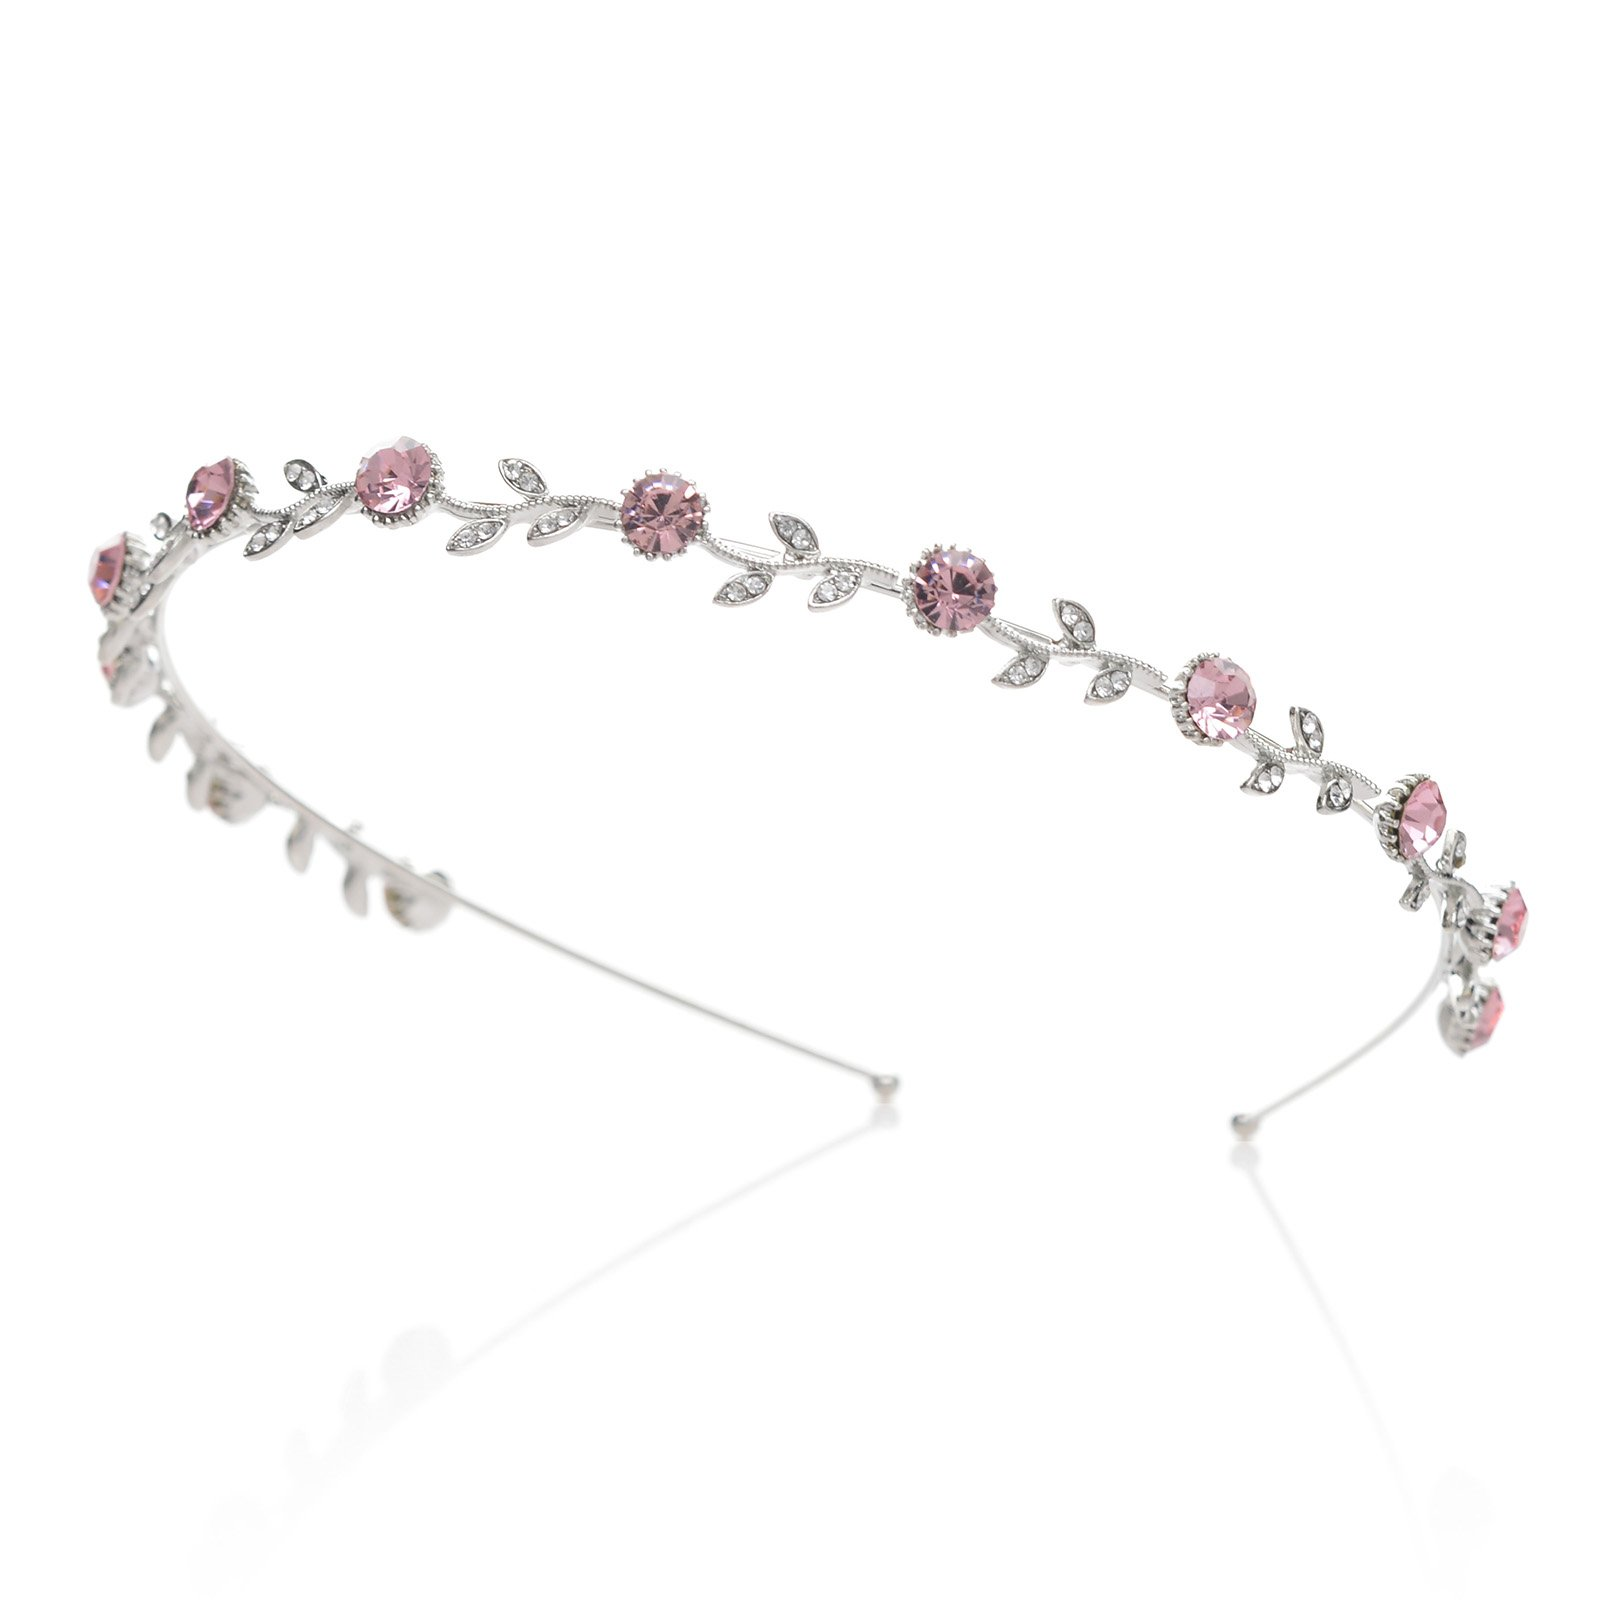 SWEETV Wedding Headband Rhinestone Hair Band Bridal Headpieces, Pink Crystal Silver Plated